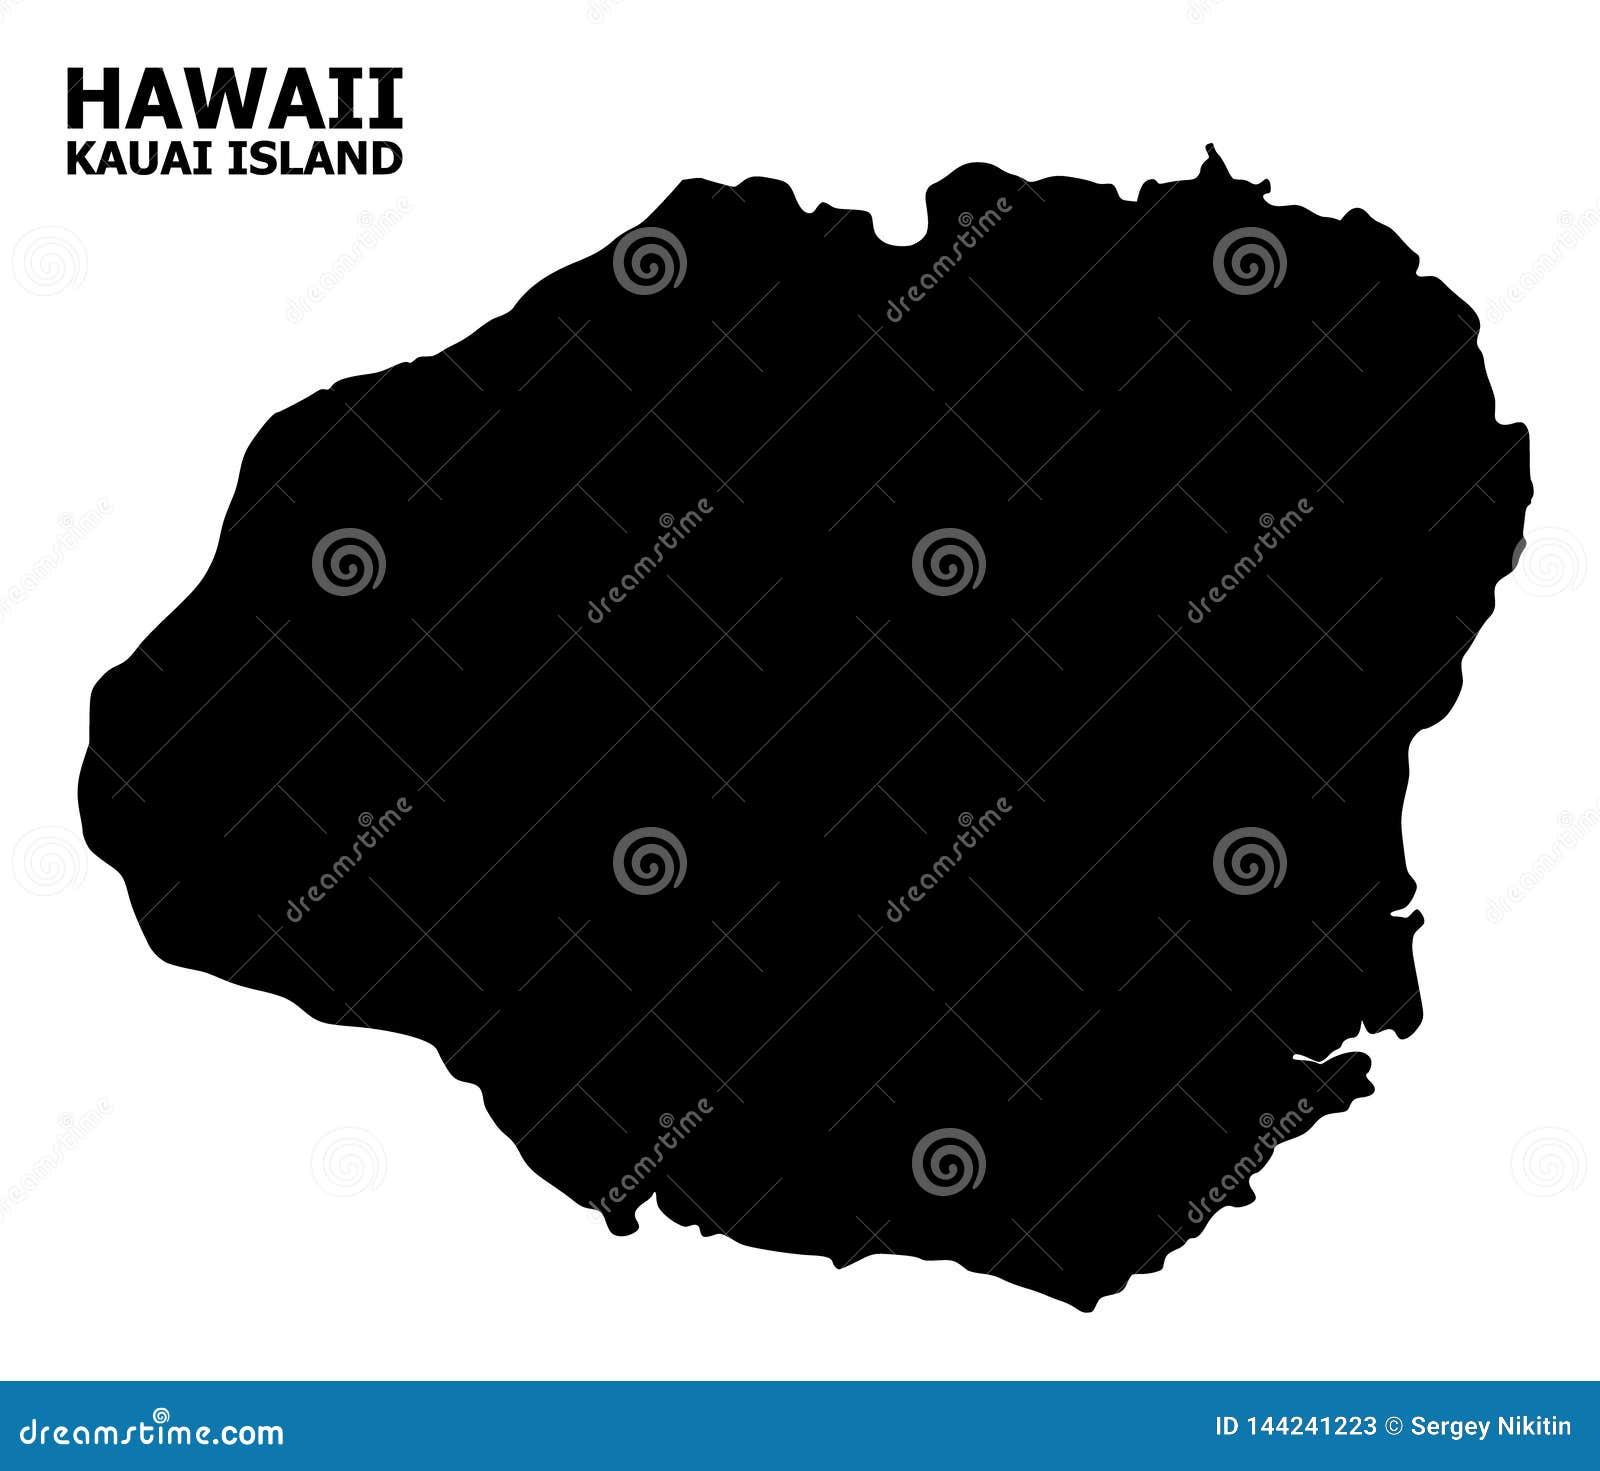 Kauai Map Stock Illustrations 223 Kauai Map Stock Illustrations Vectors Clipart Dreamstime